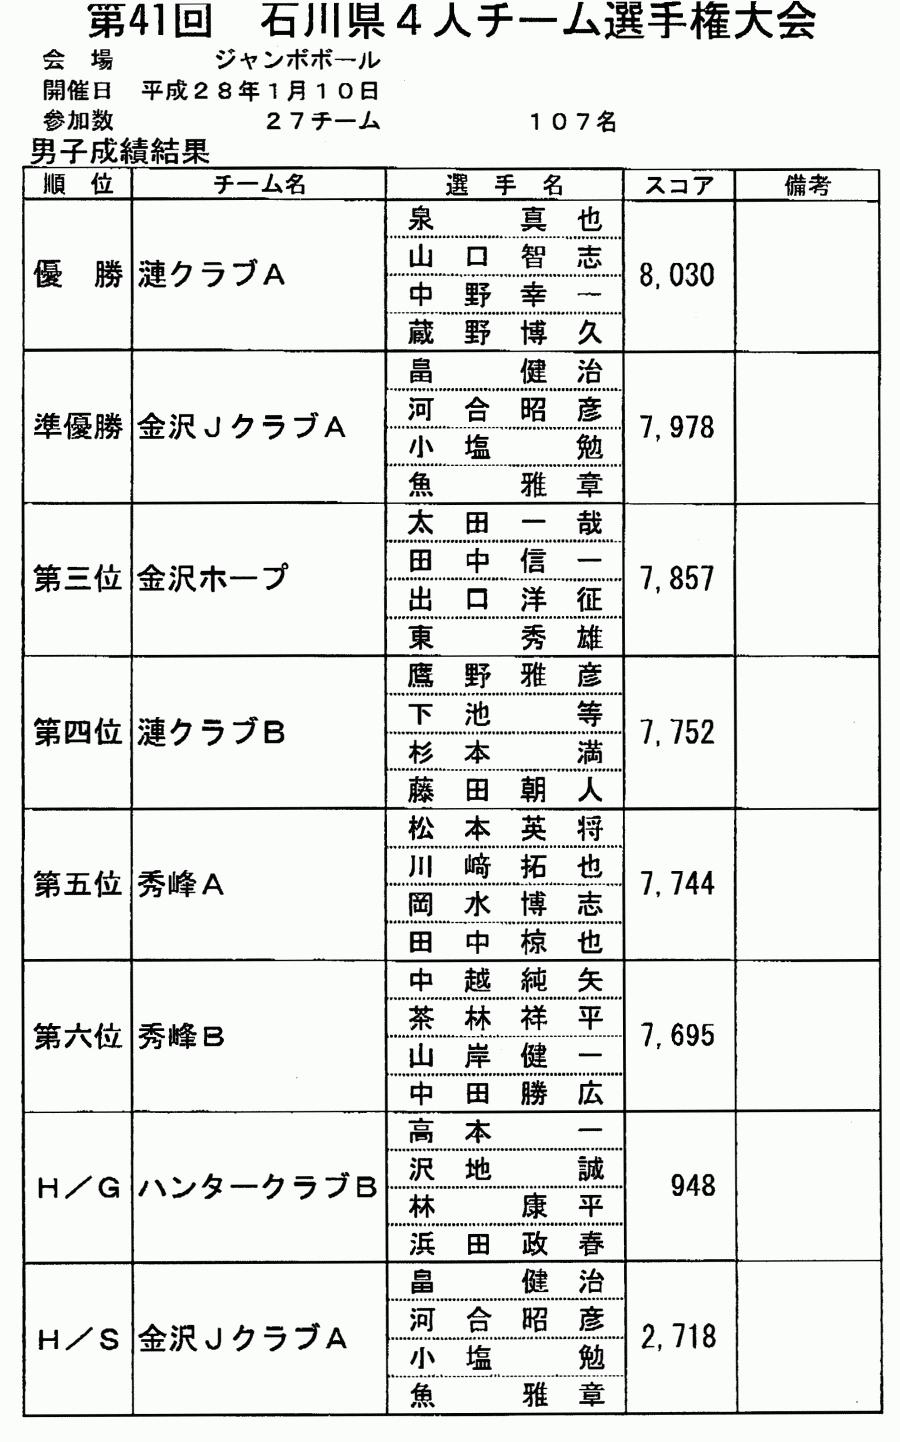 第41回 石川県4人チーム選手権大会_男子